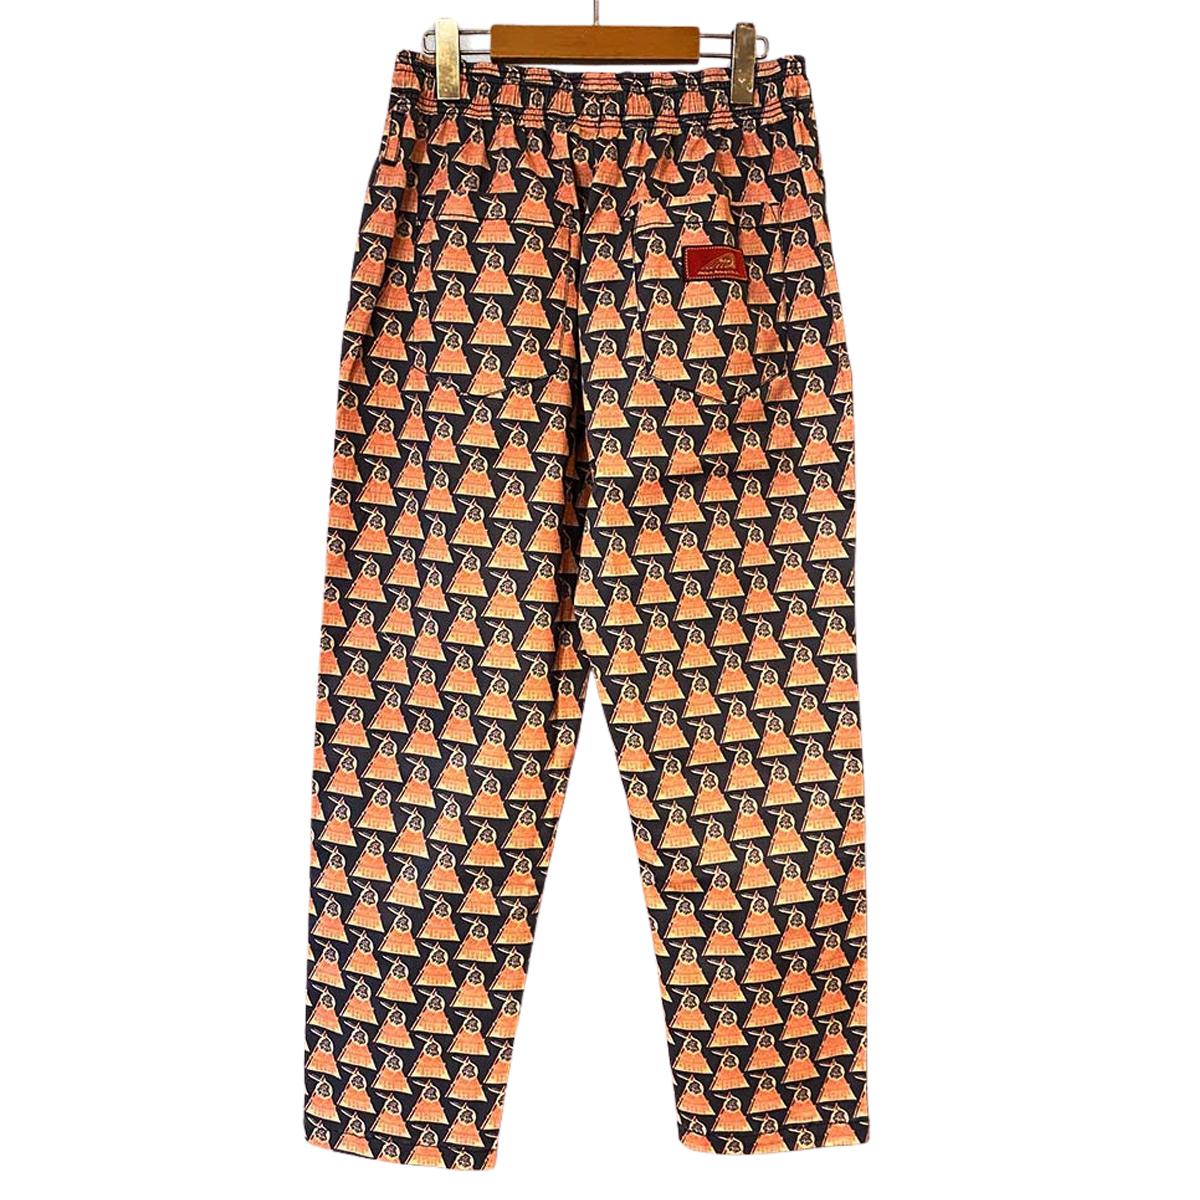 Indian インディアン Garage Pants ティピー